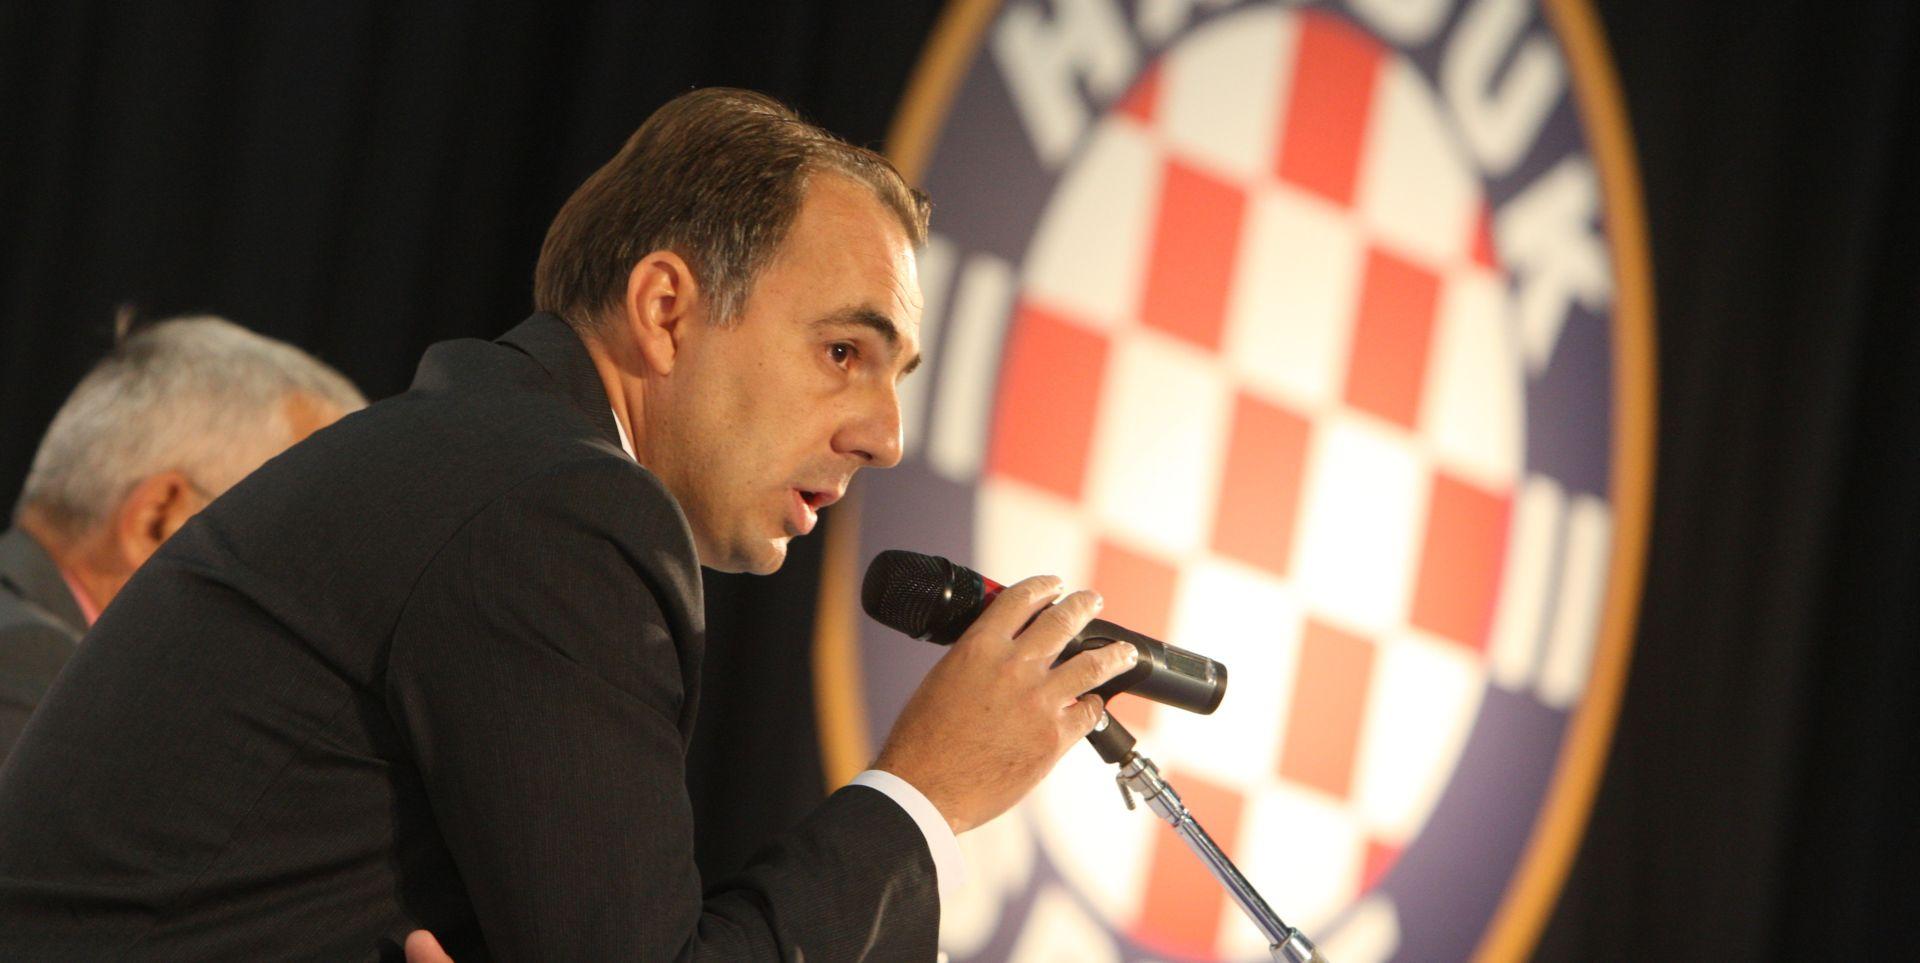 Vinko Radovani novi predsjednik NS Splitsko-dalmatinske županije